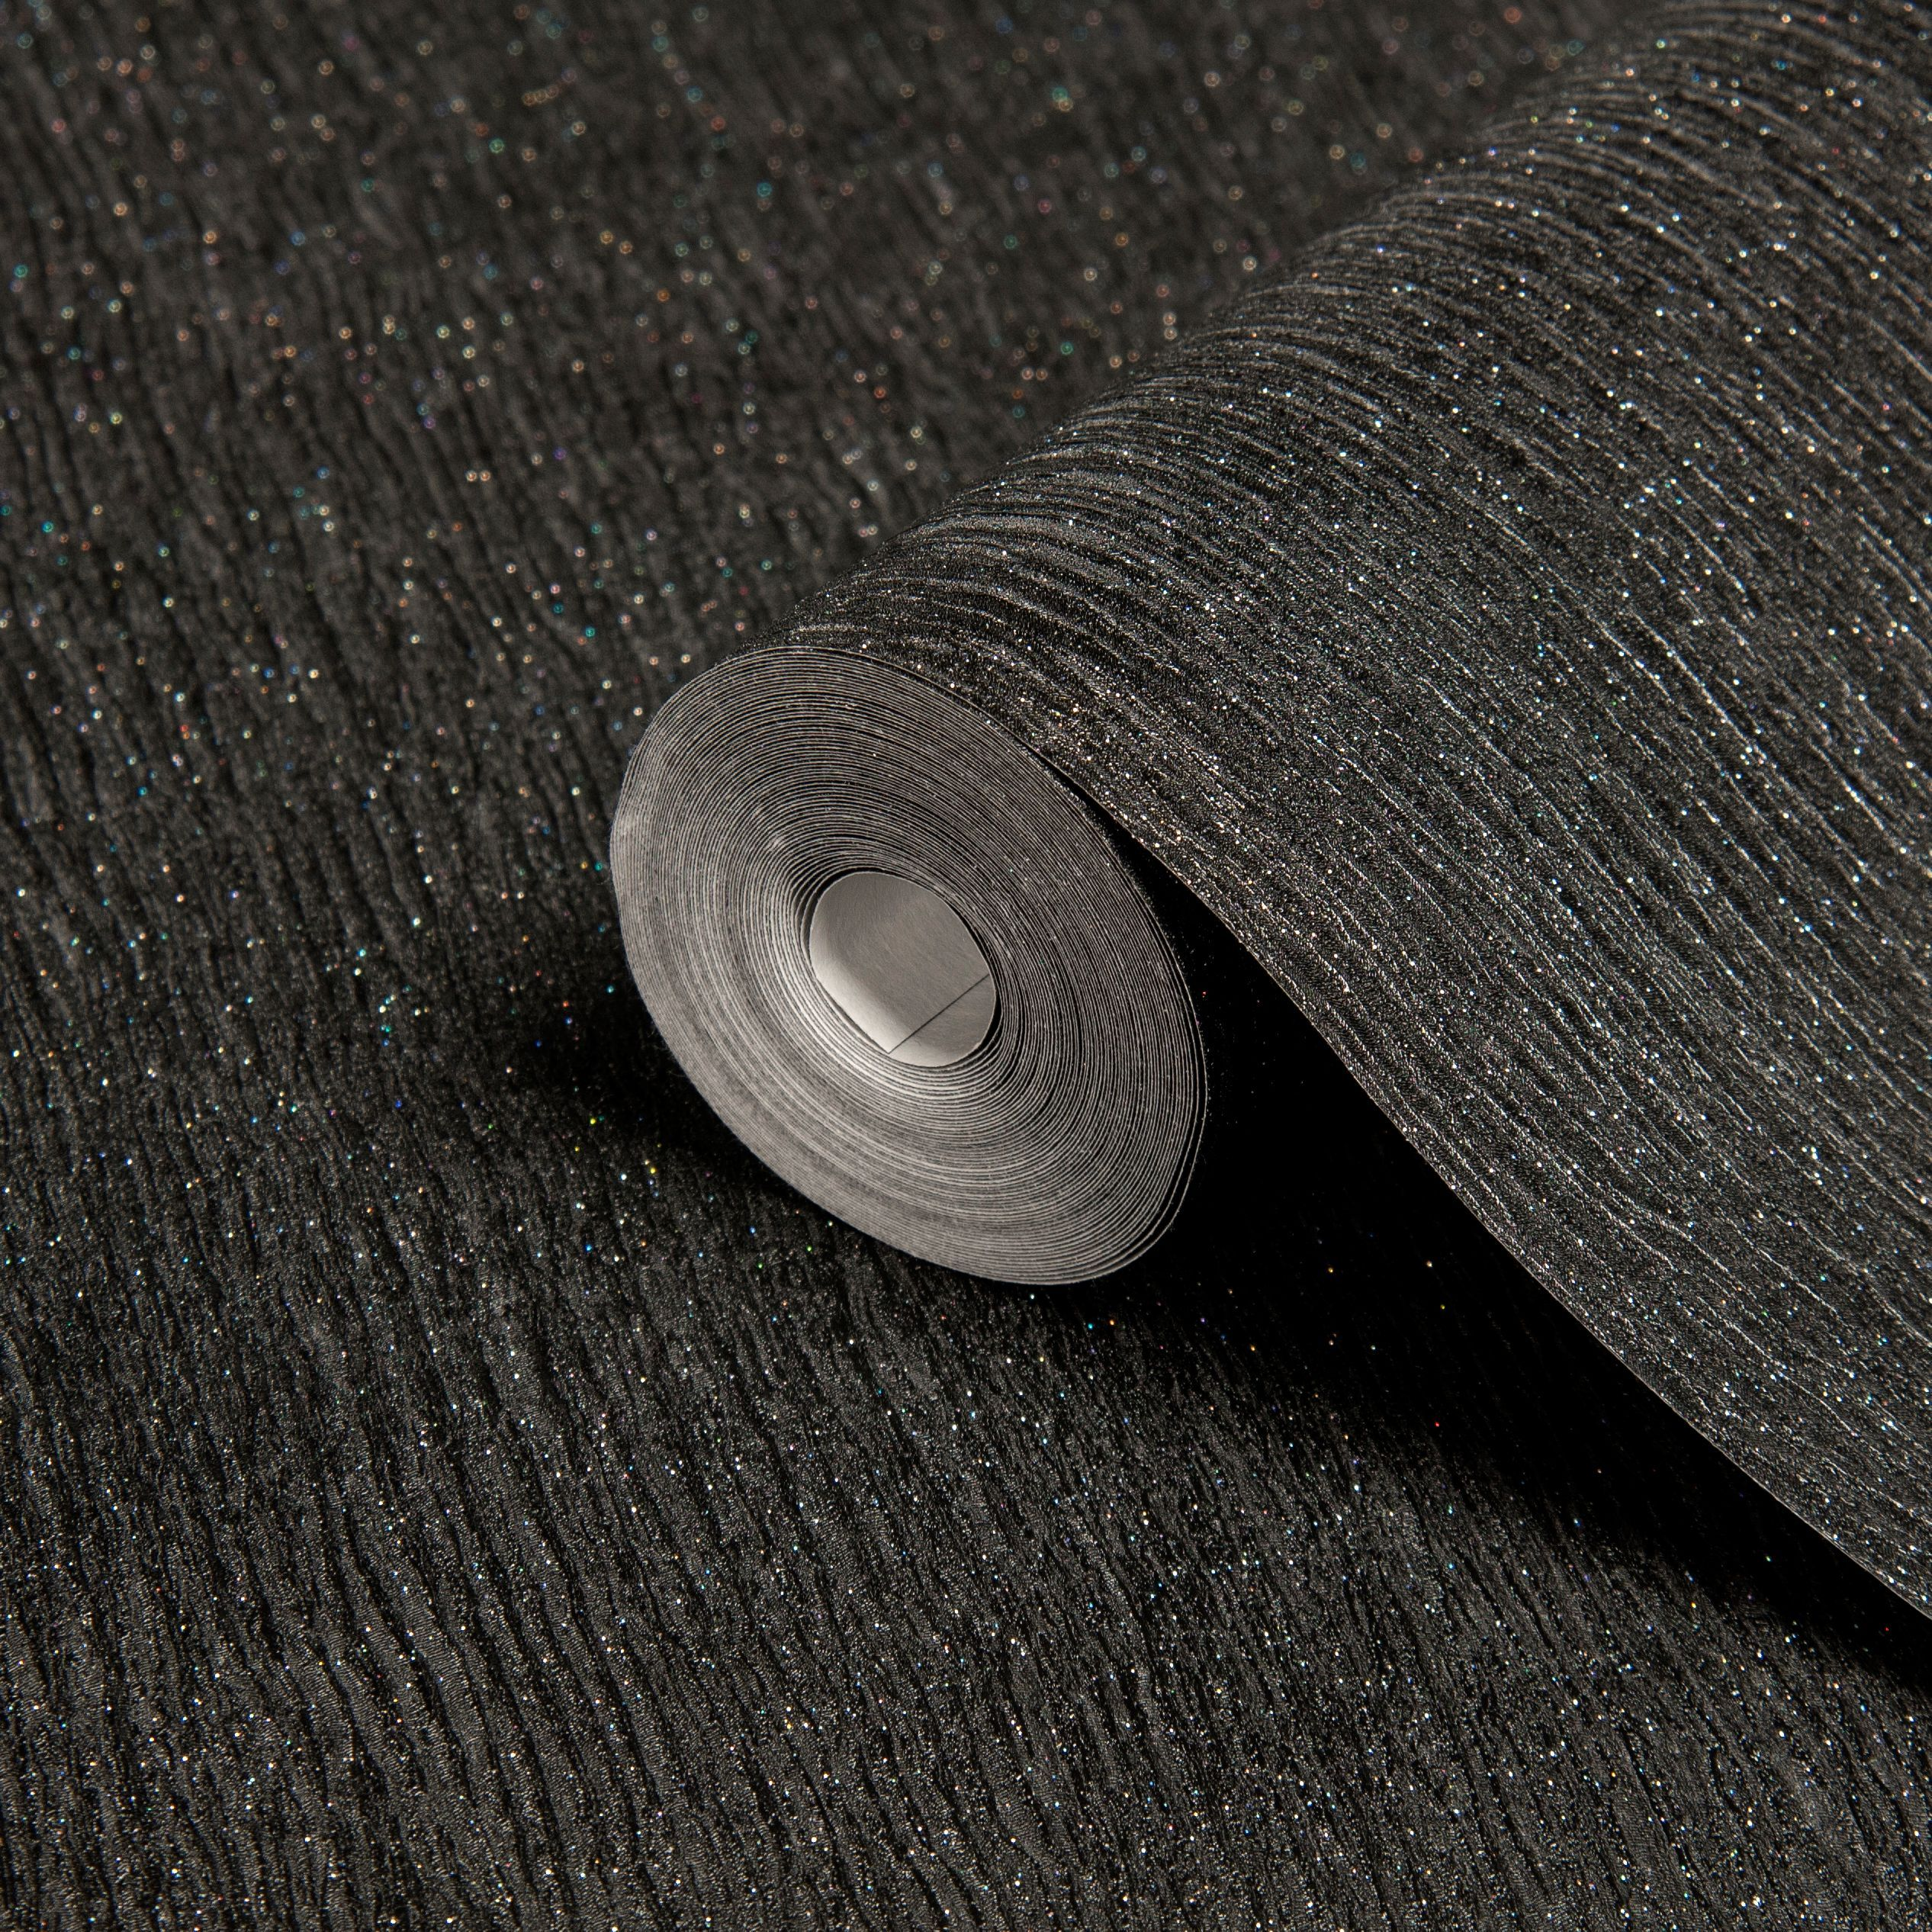 Disco Black Glitter Effect Wallpaper Departments Diy At B Q Black Glitter Wallpapers Glitter Wallpaper Diy Wallpaper